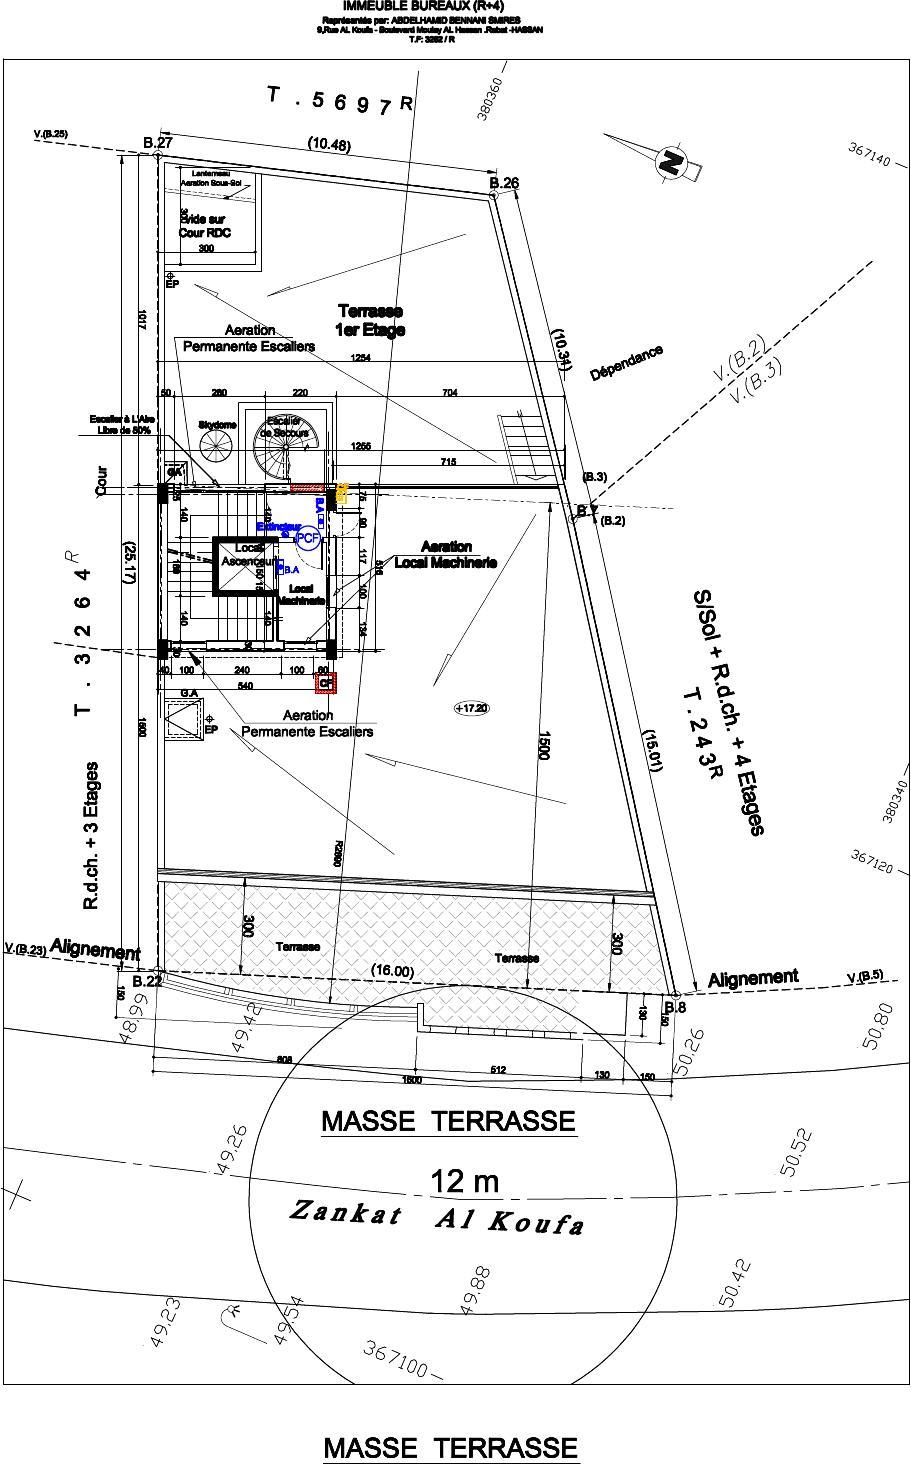 Masse terrasse